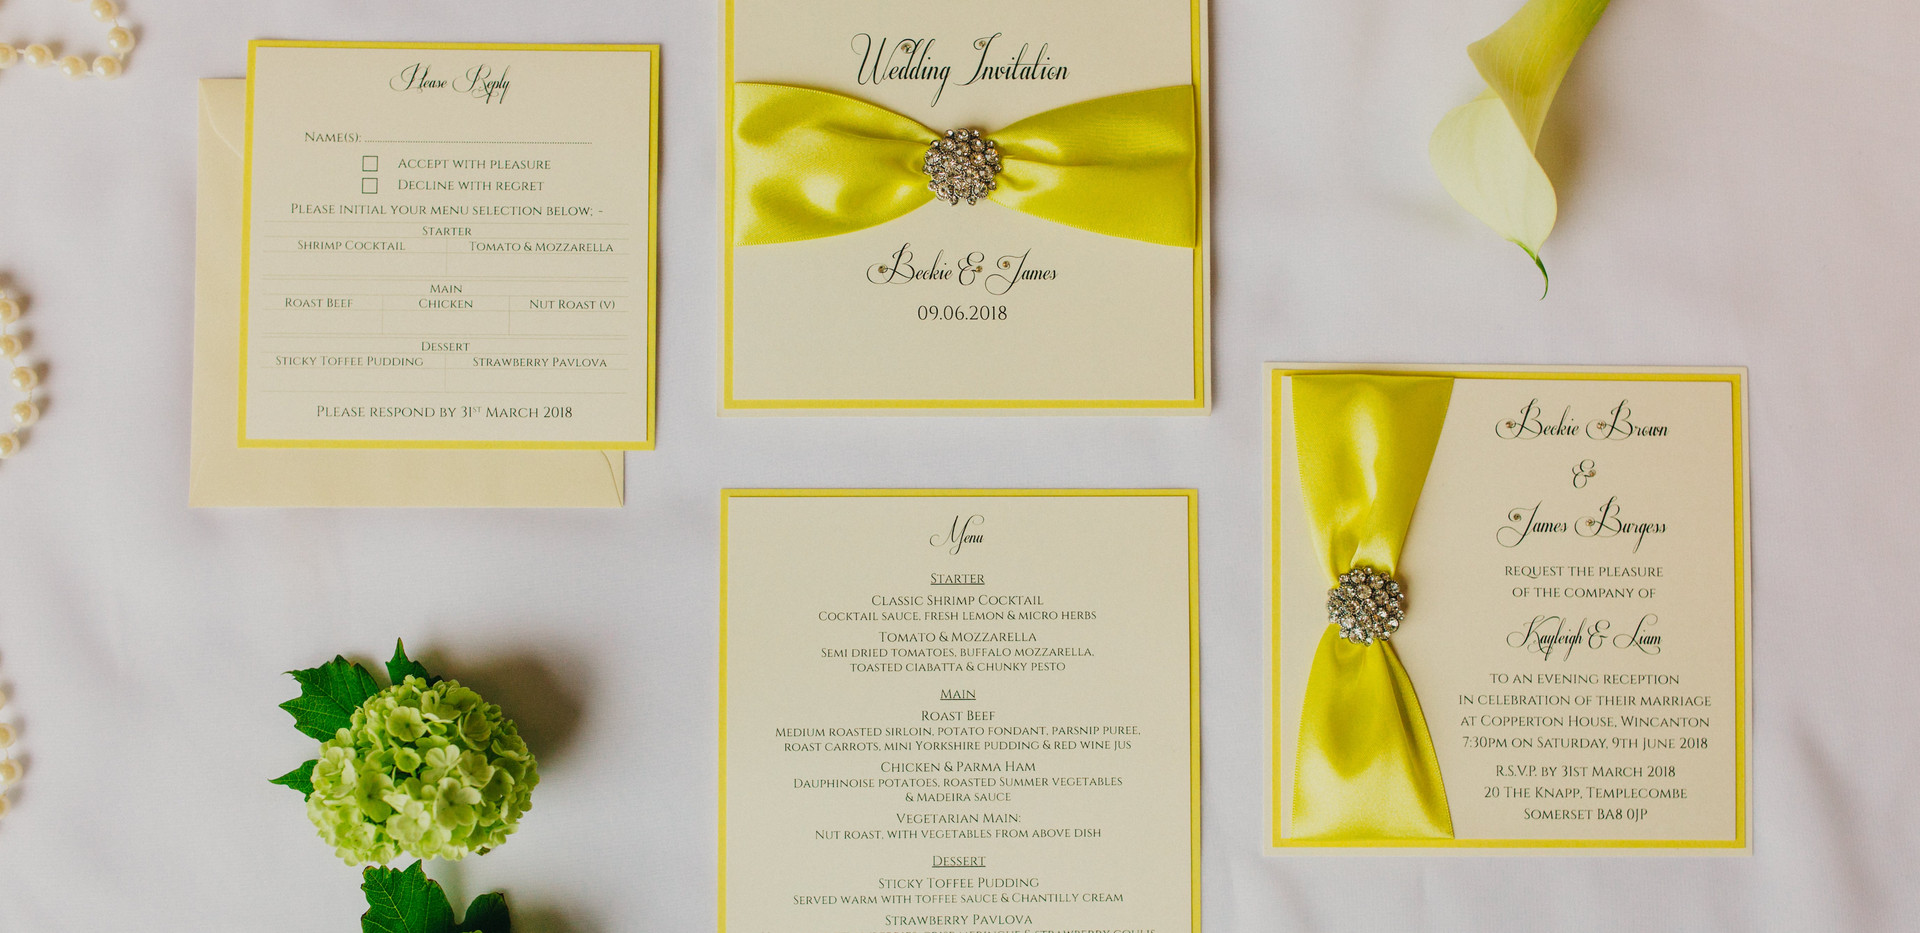 Lily & Lottie Stationery - Wedding Invitations Dorset